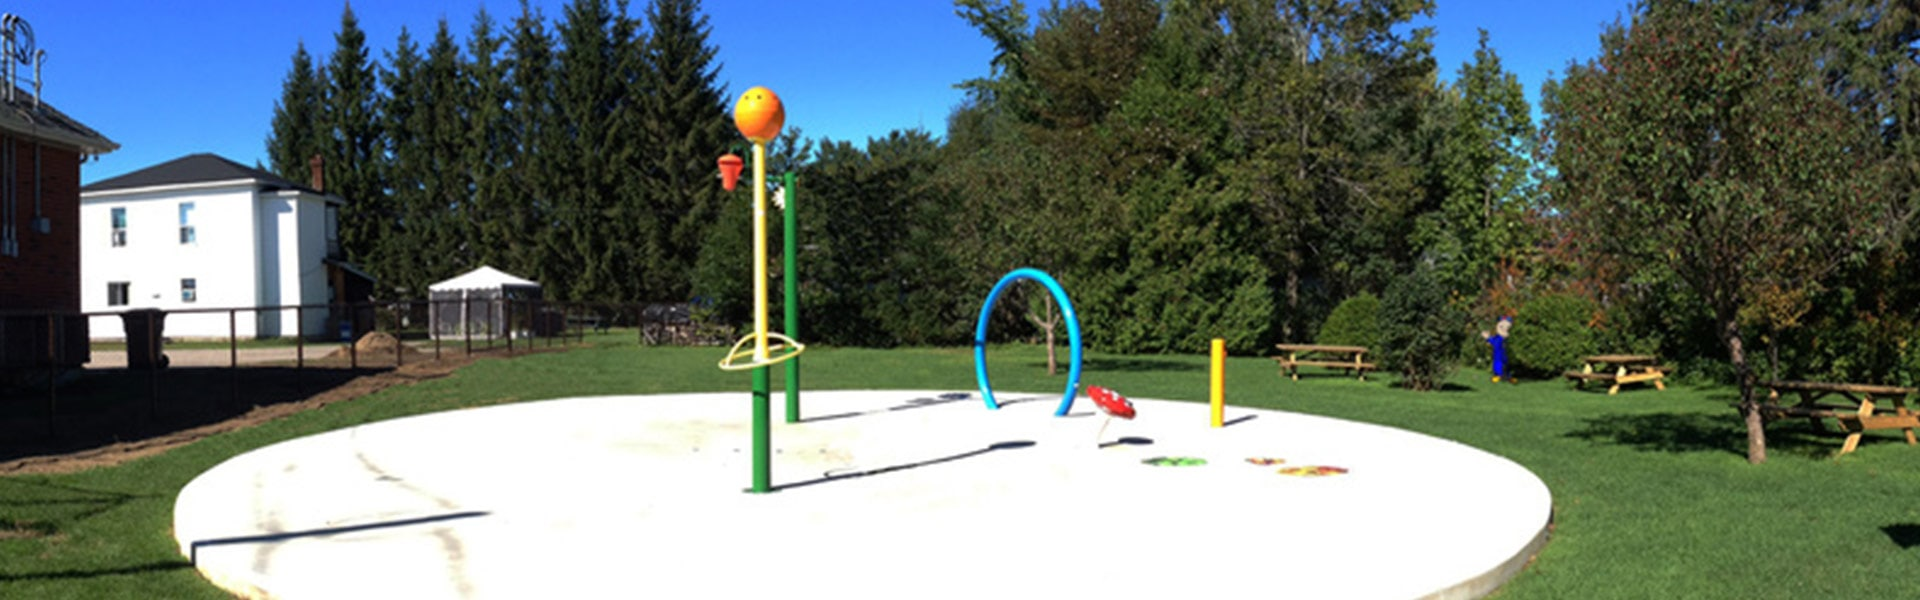 Parc Rosina-Aubin